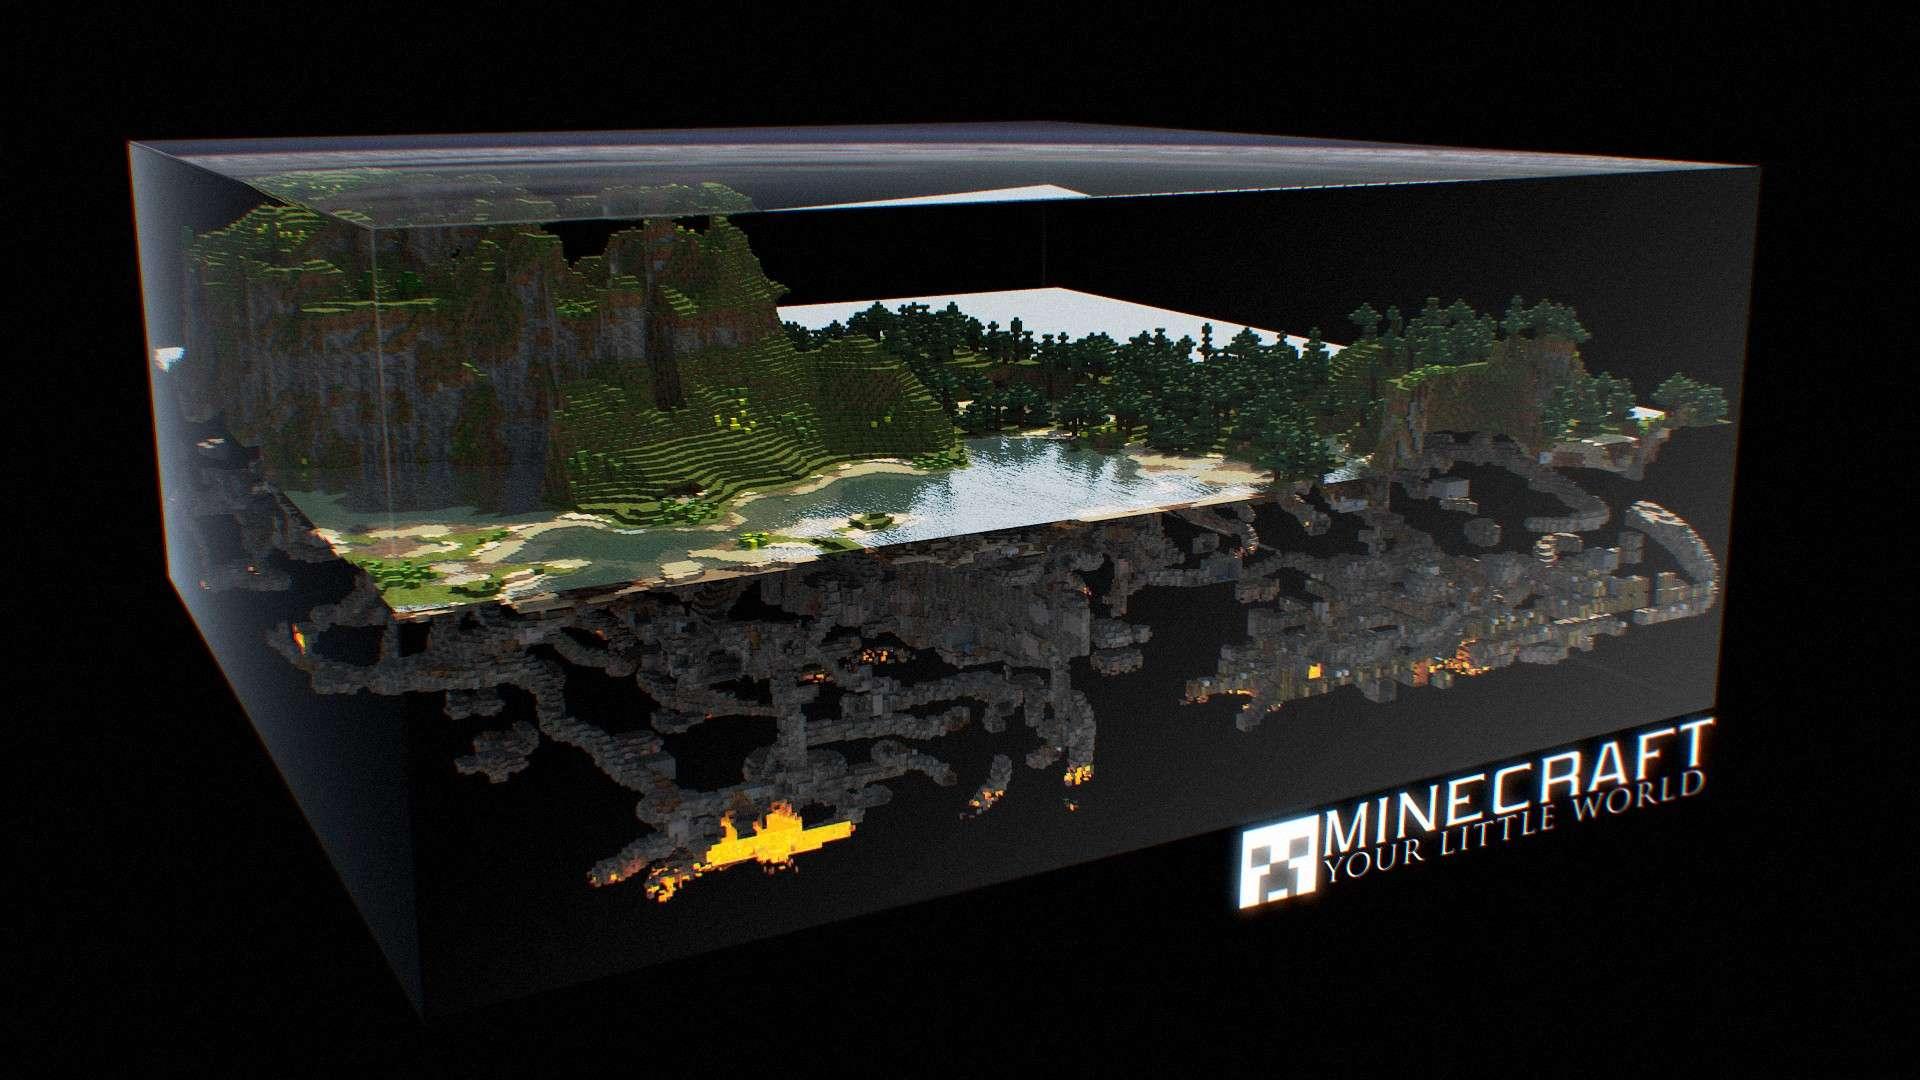 Minecraft HD Wallpaper Background Image 1920x1080 ID340213 1920x1080